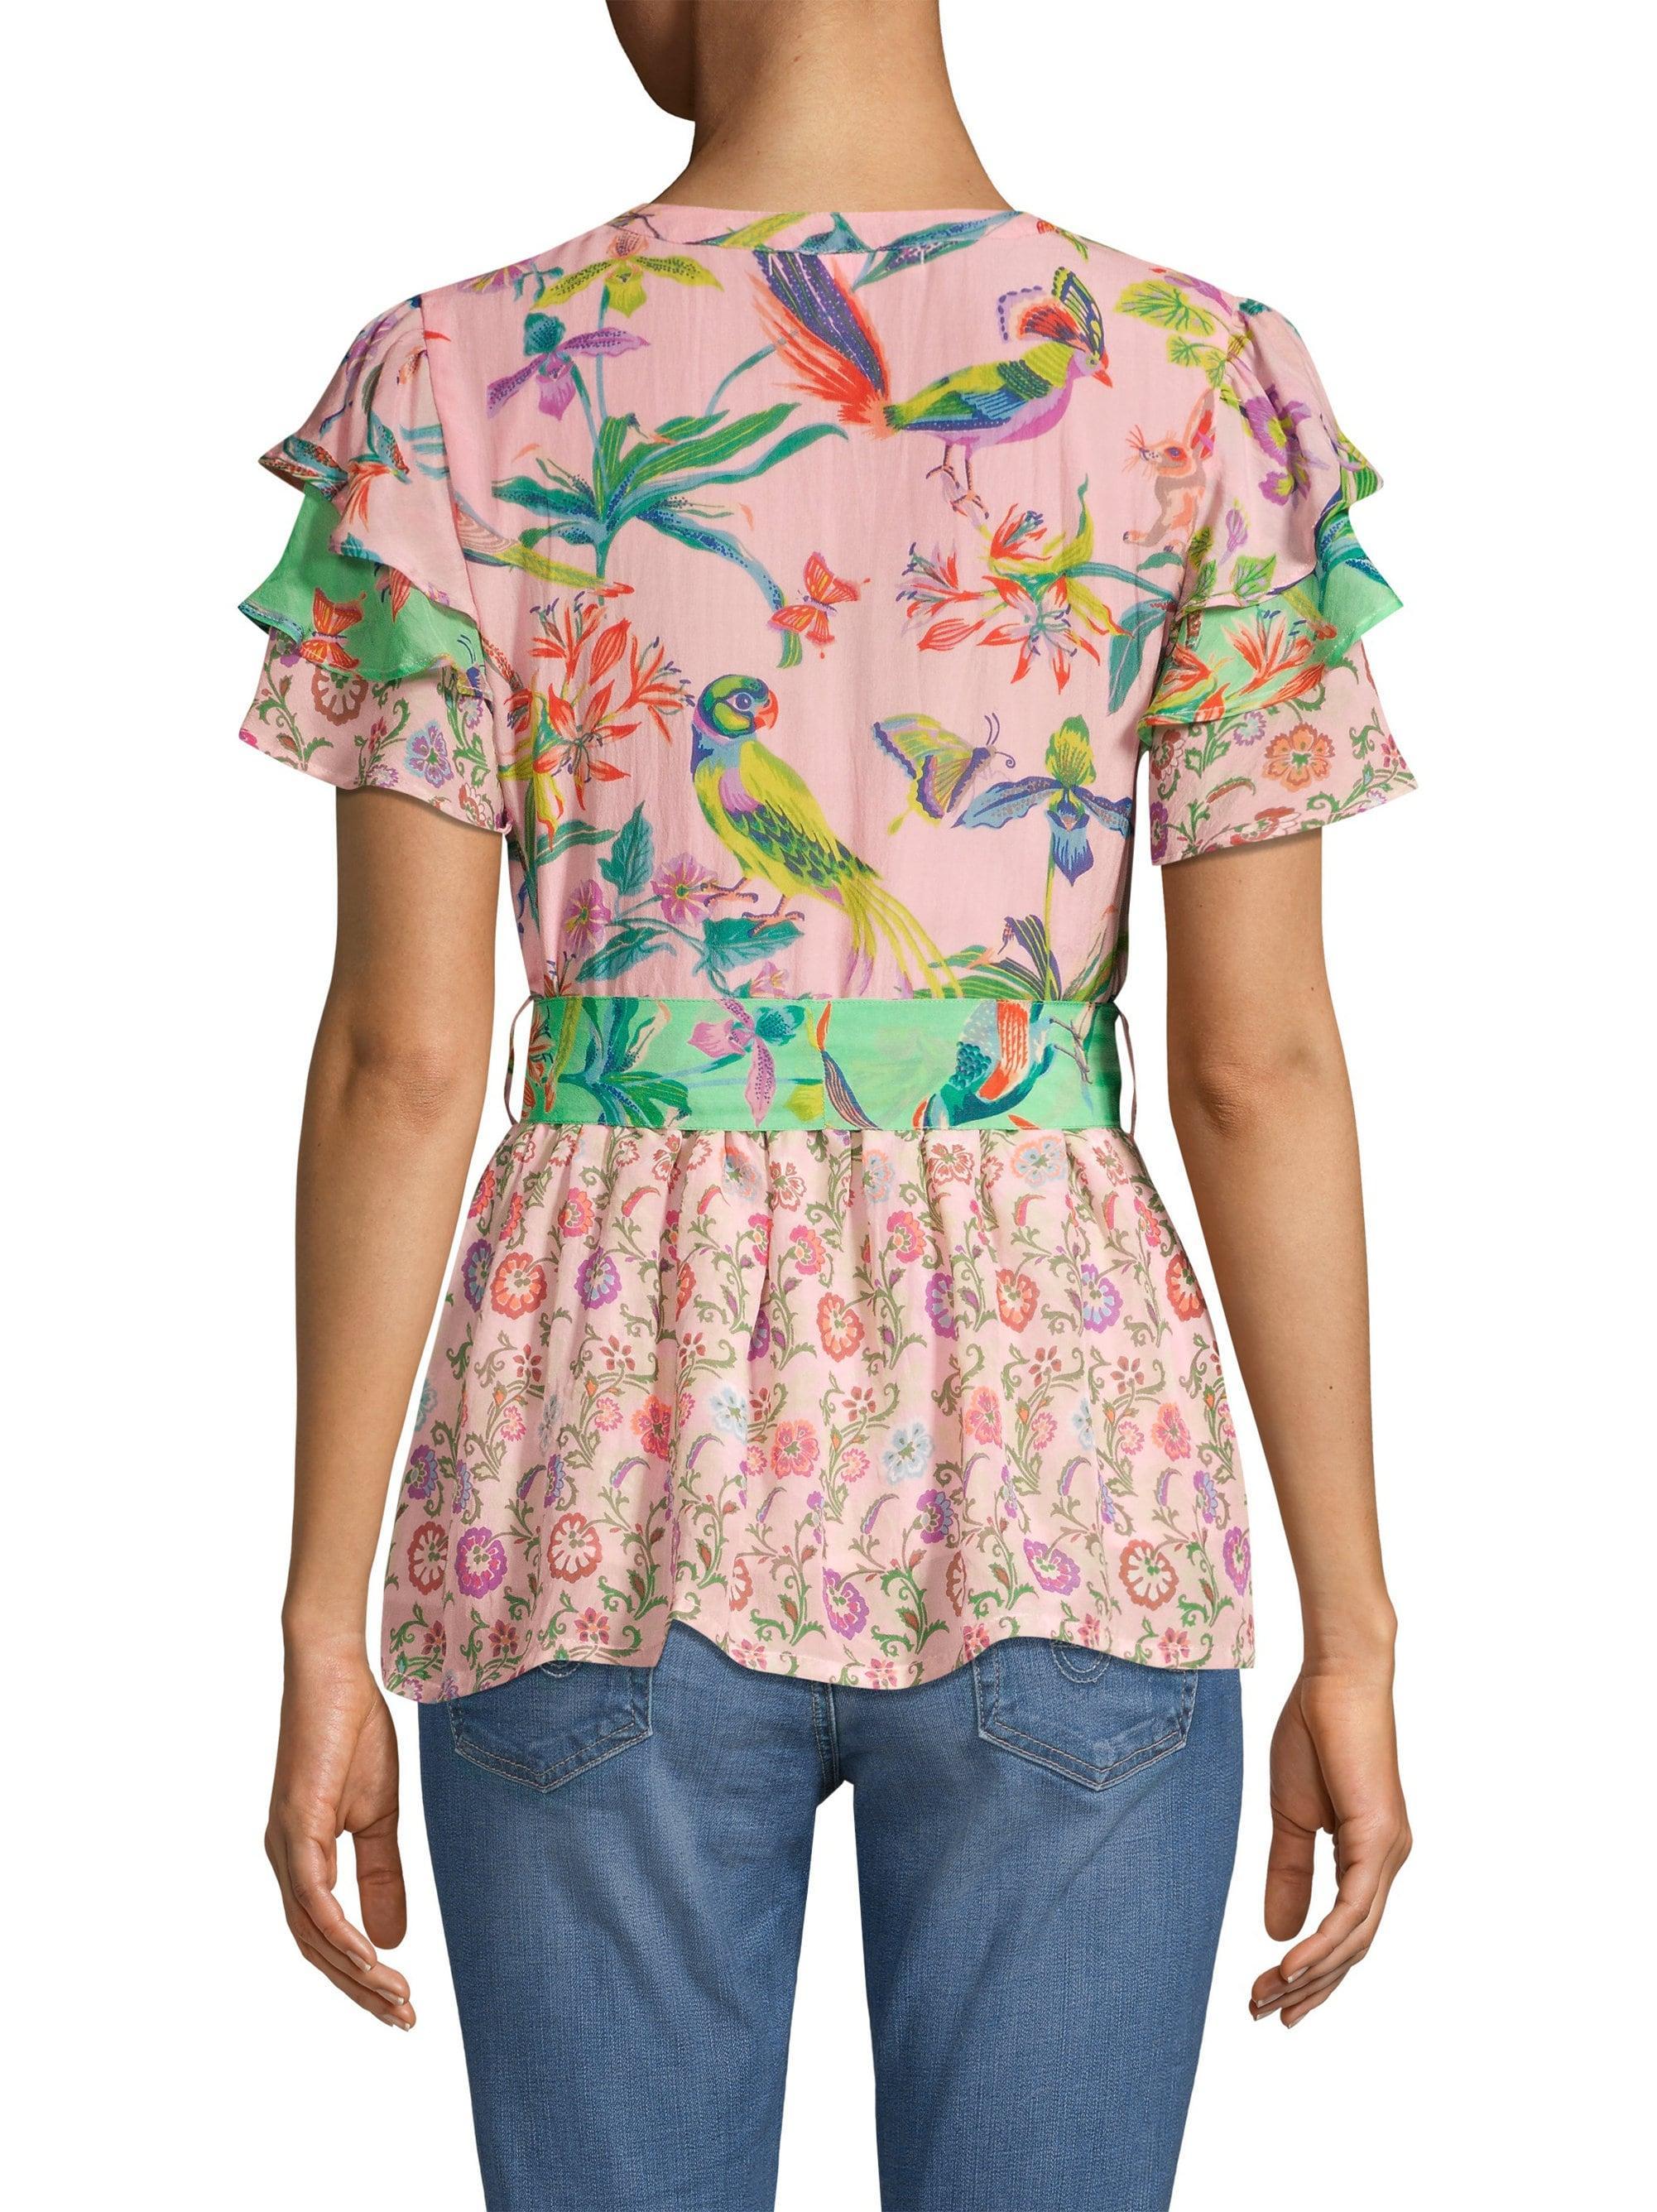 232a2beedfe0a2 Banjanan Jaya Contrast Floral   Avian Print Tie Short-sleeve Silk ...